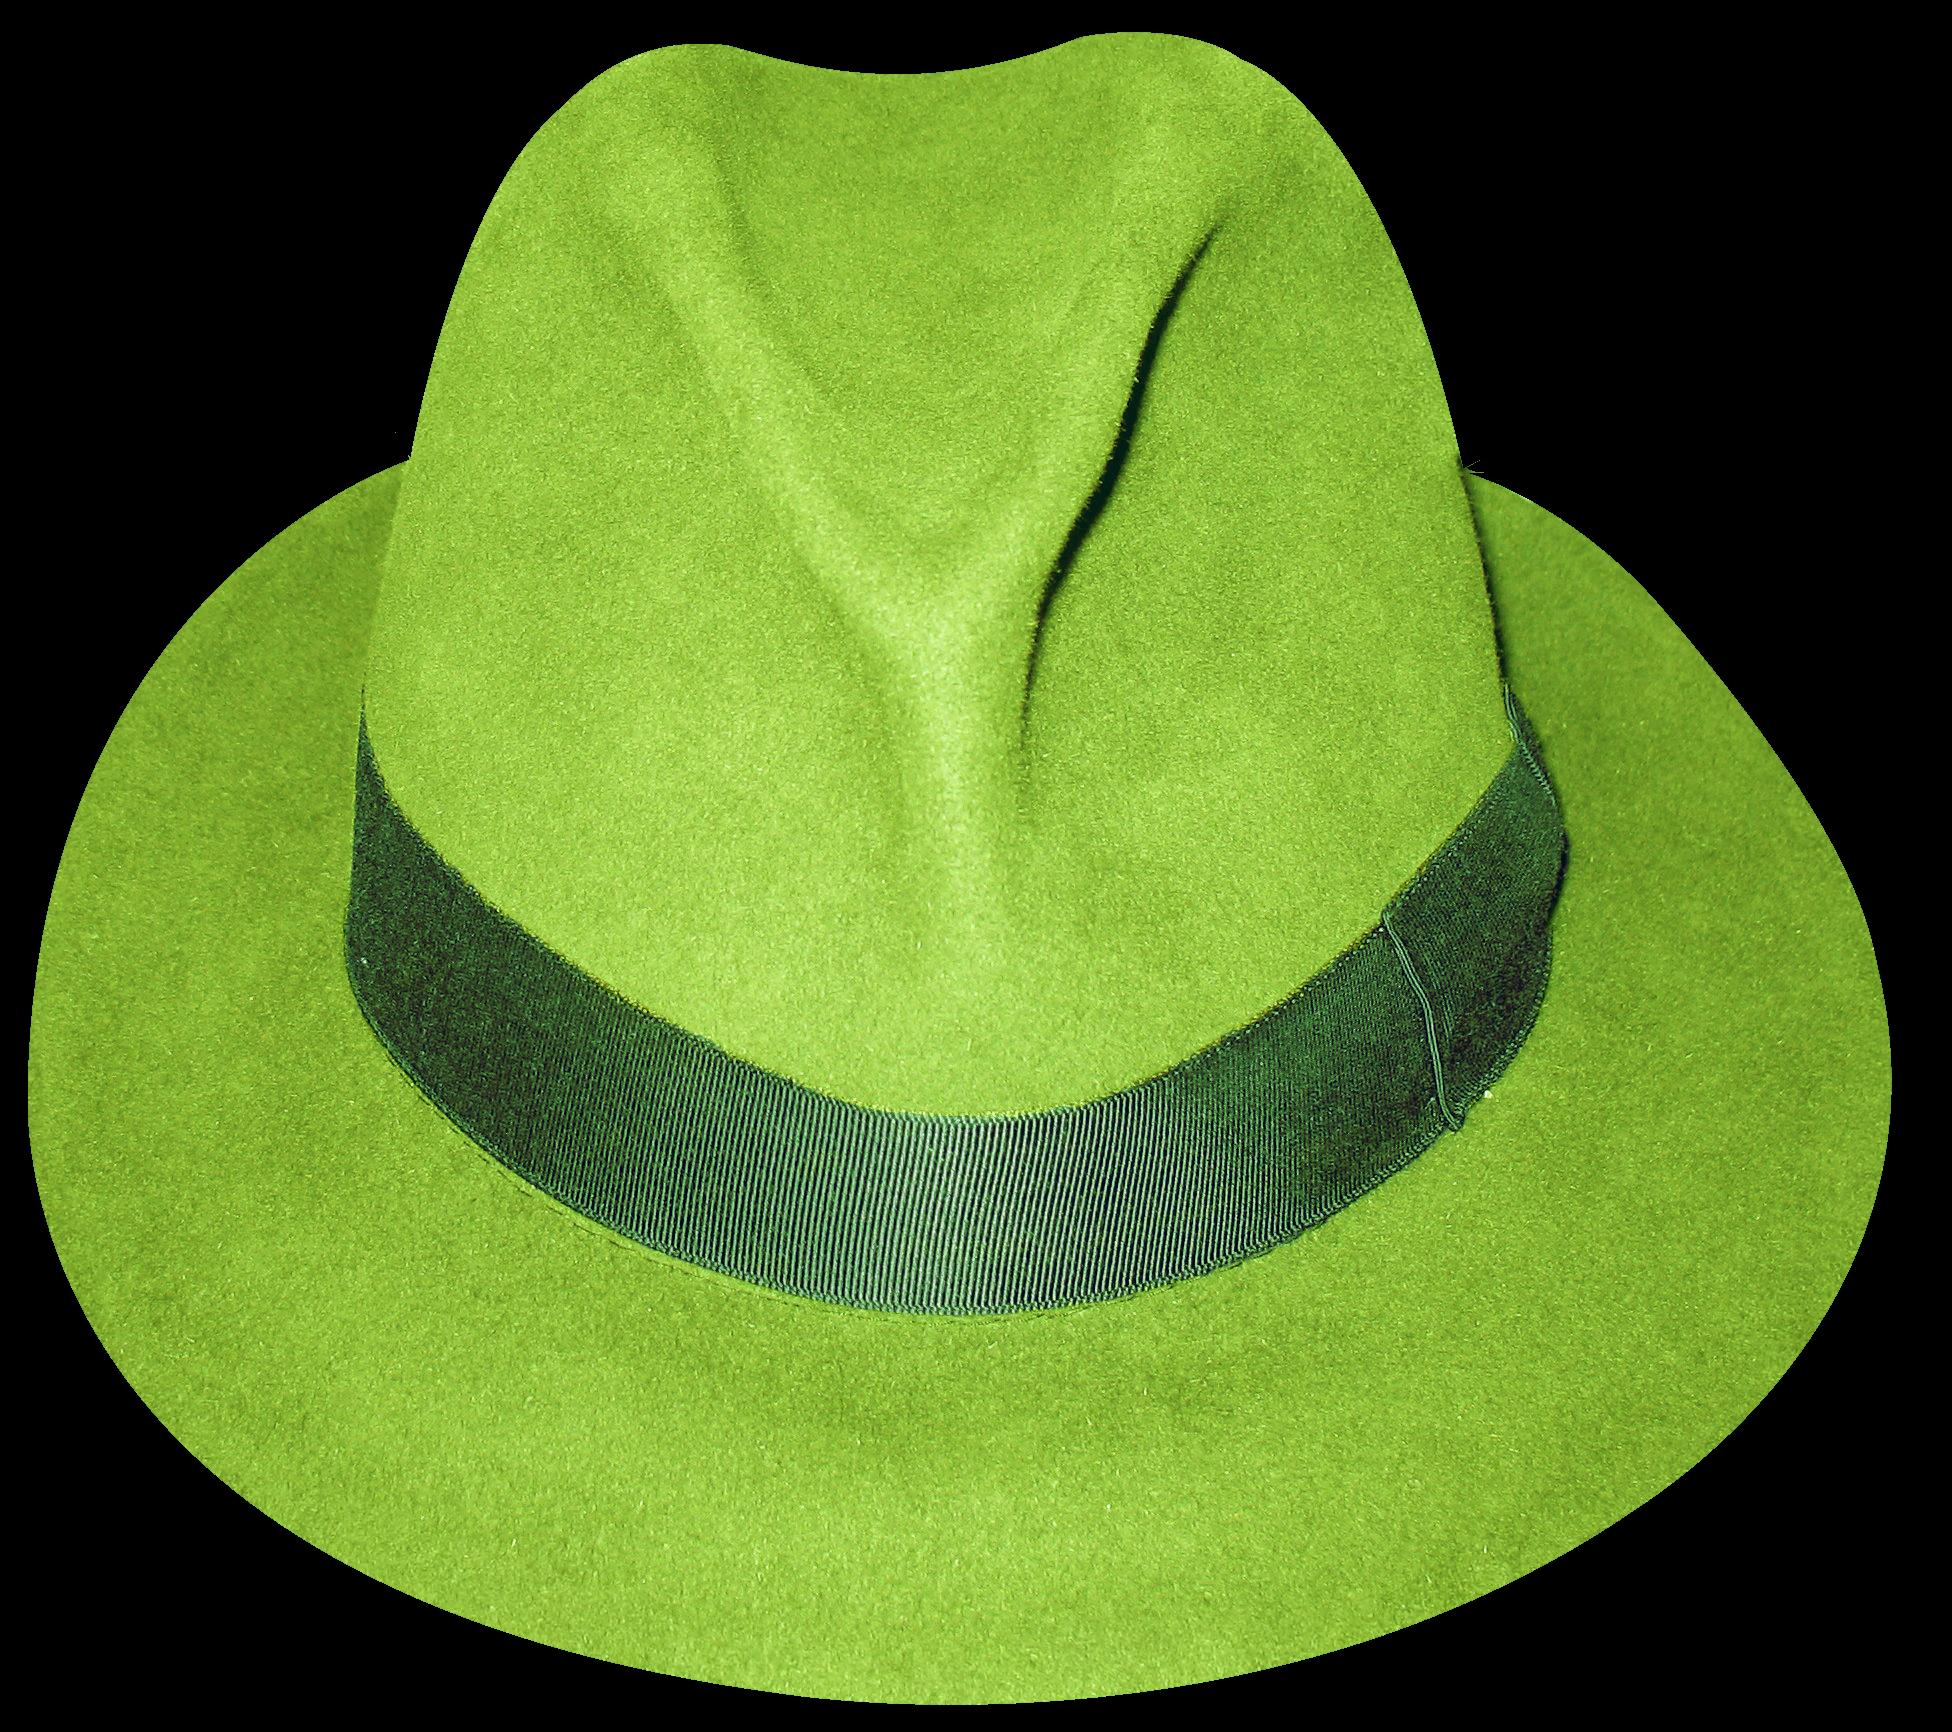 8a7fa948c43 File Hatt2green.png - Wikimedia Commons